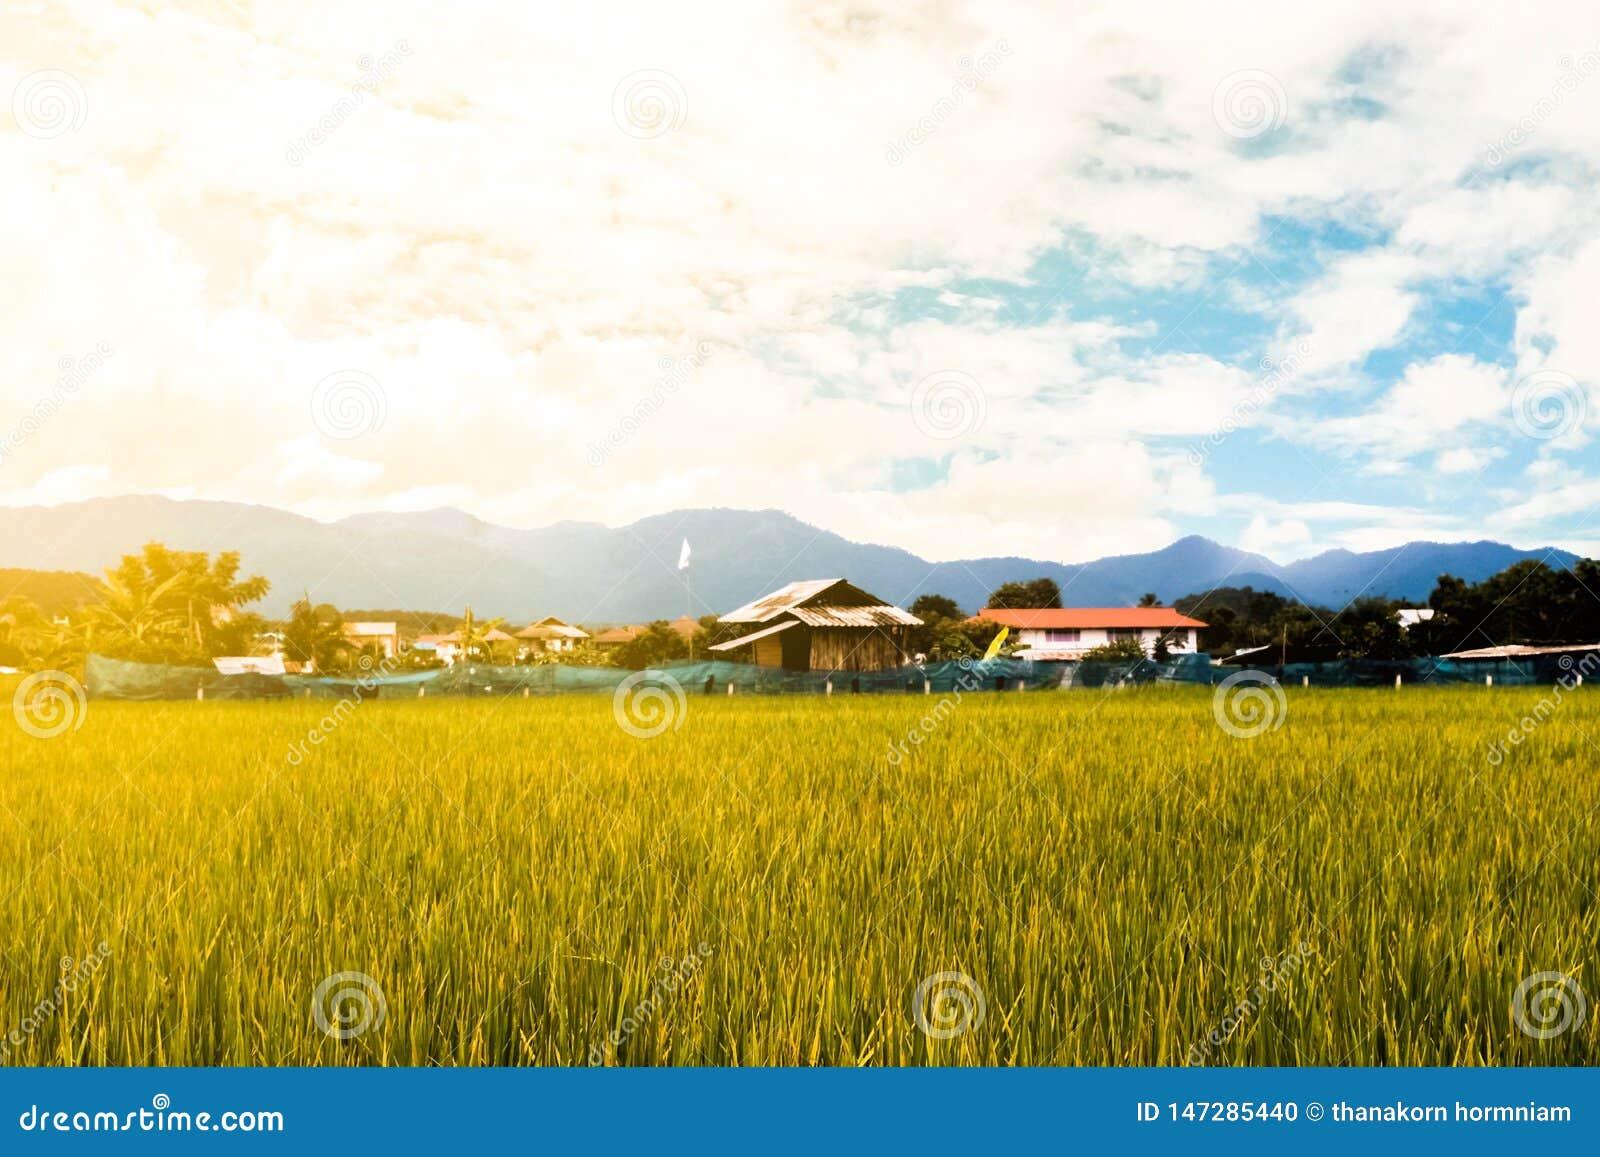 Fondo del campo del arroz